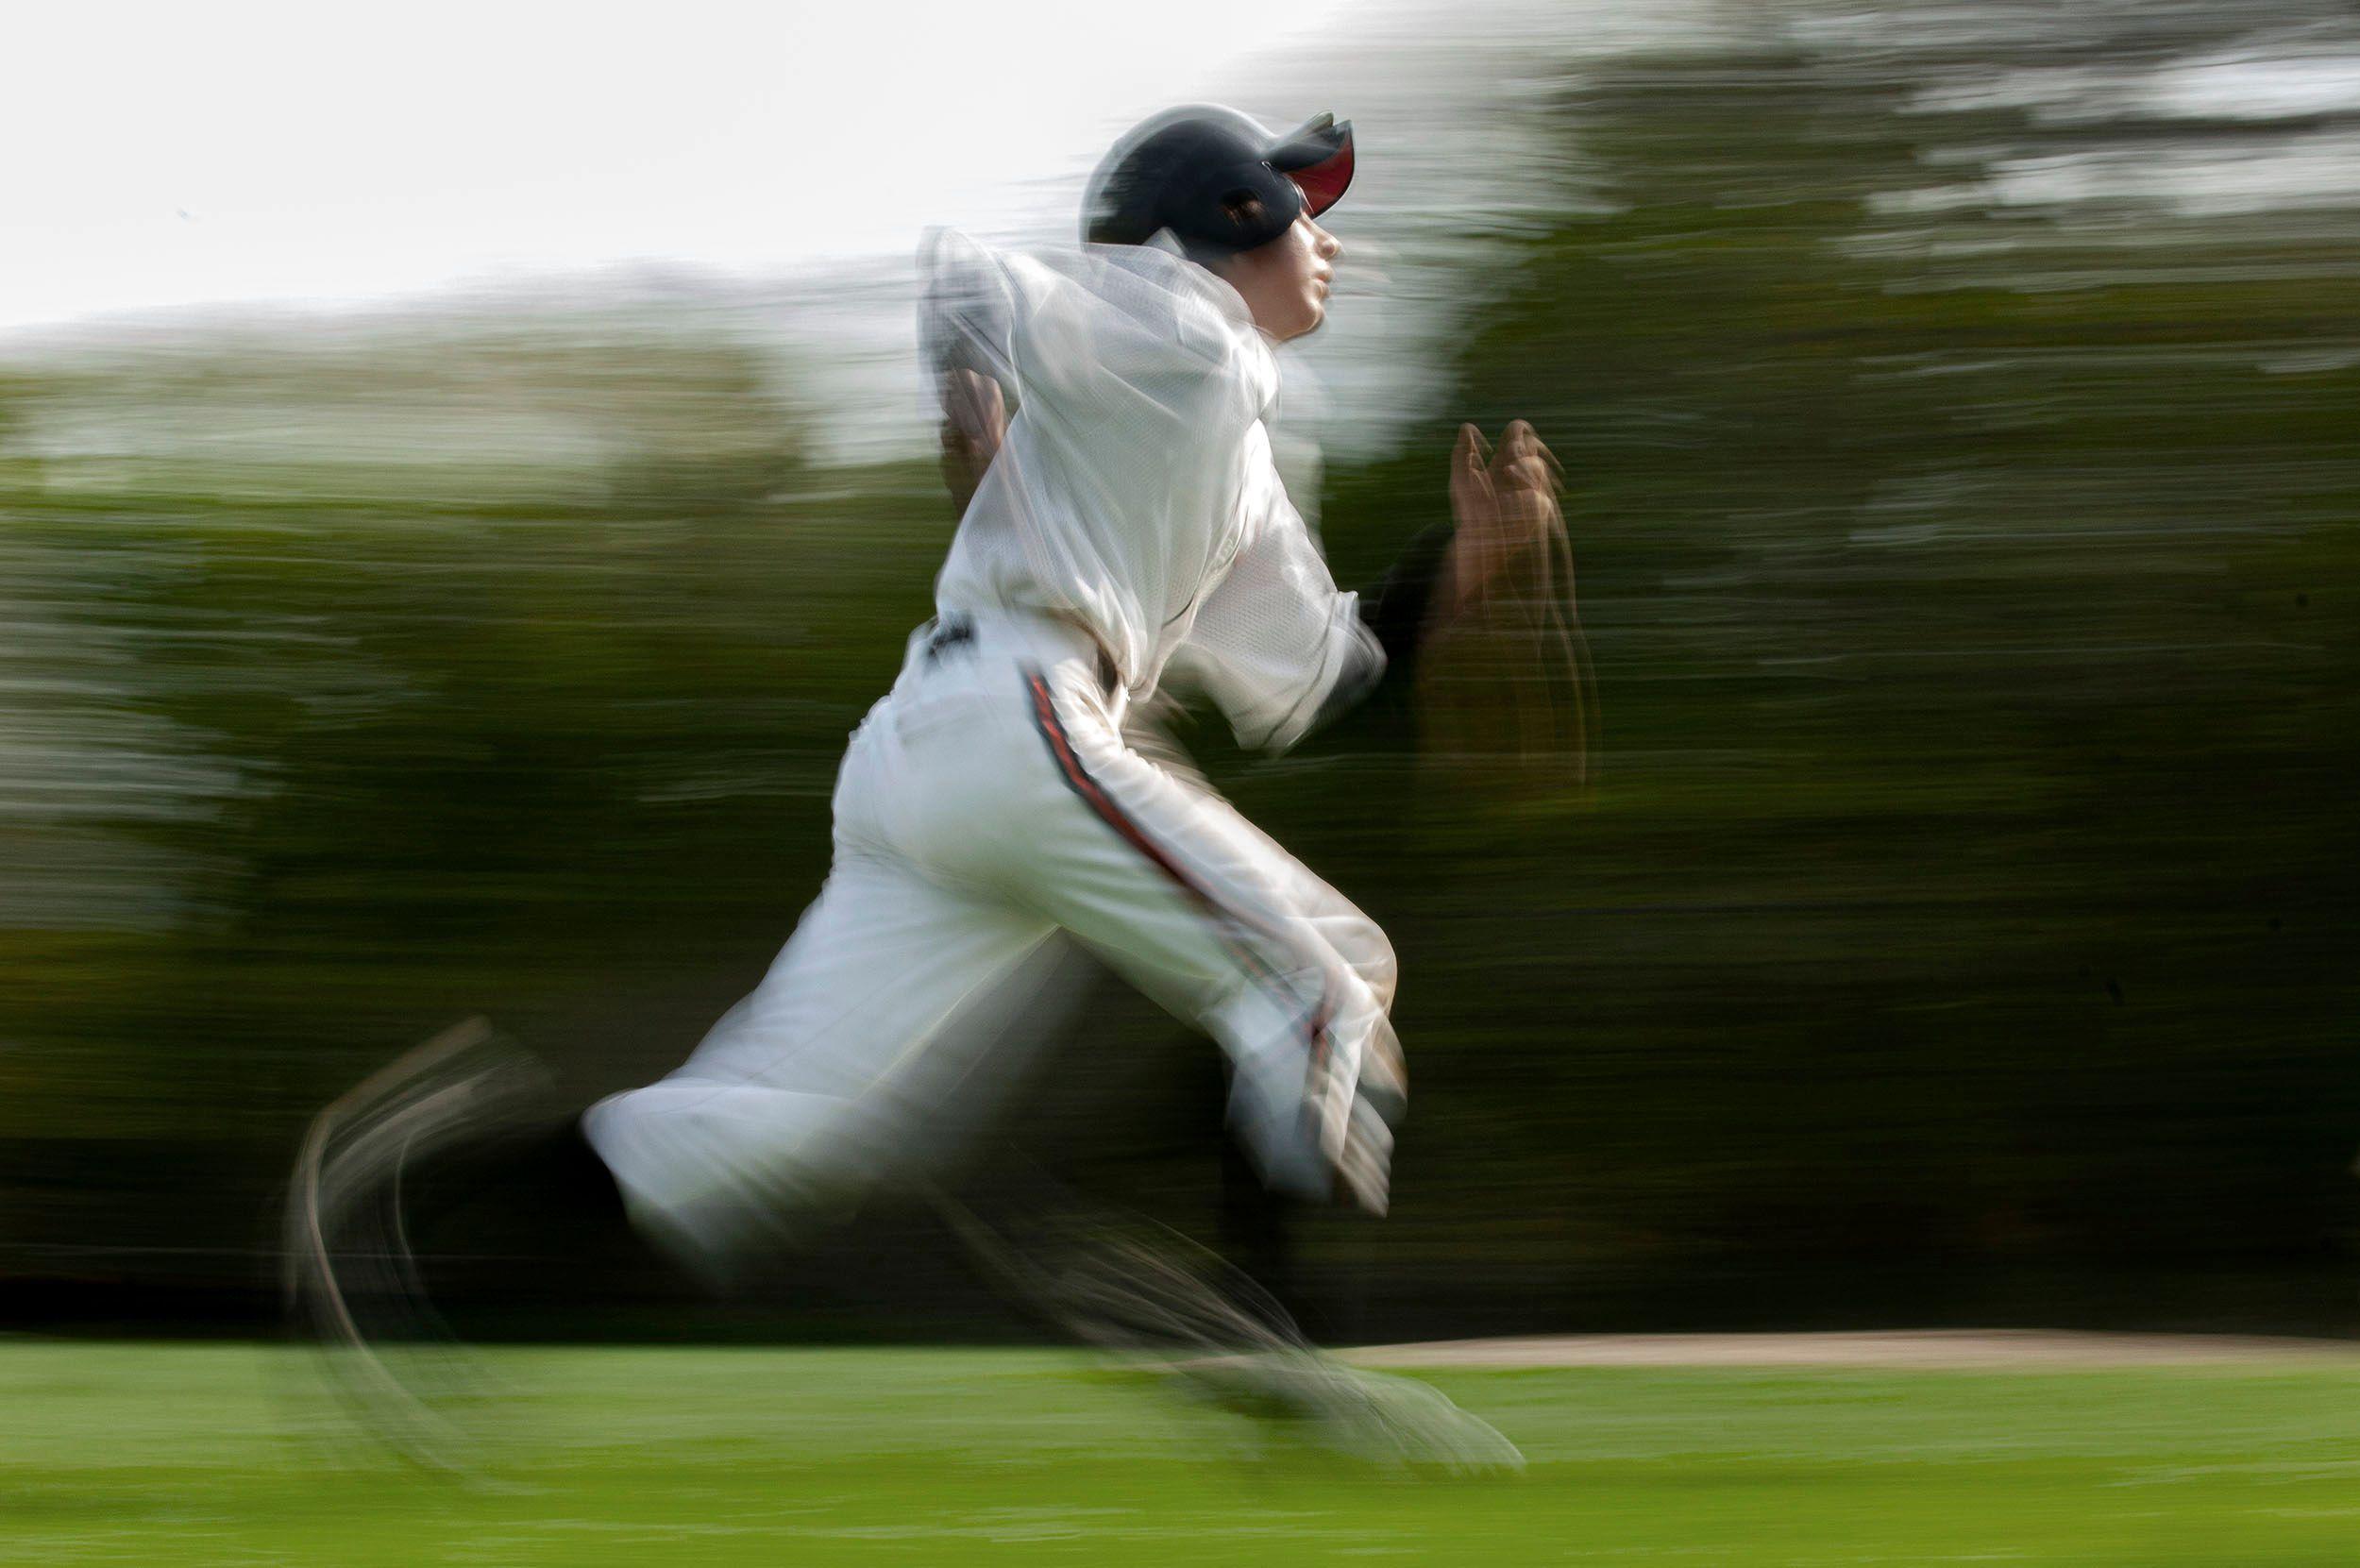 Boston Sports Photography